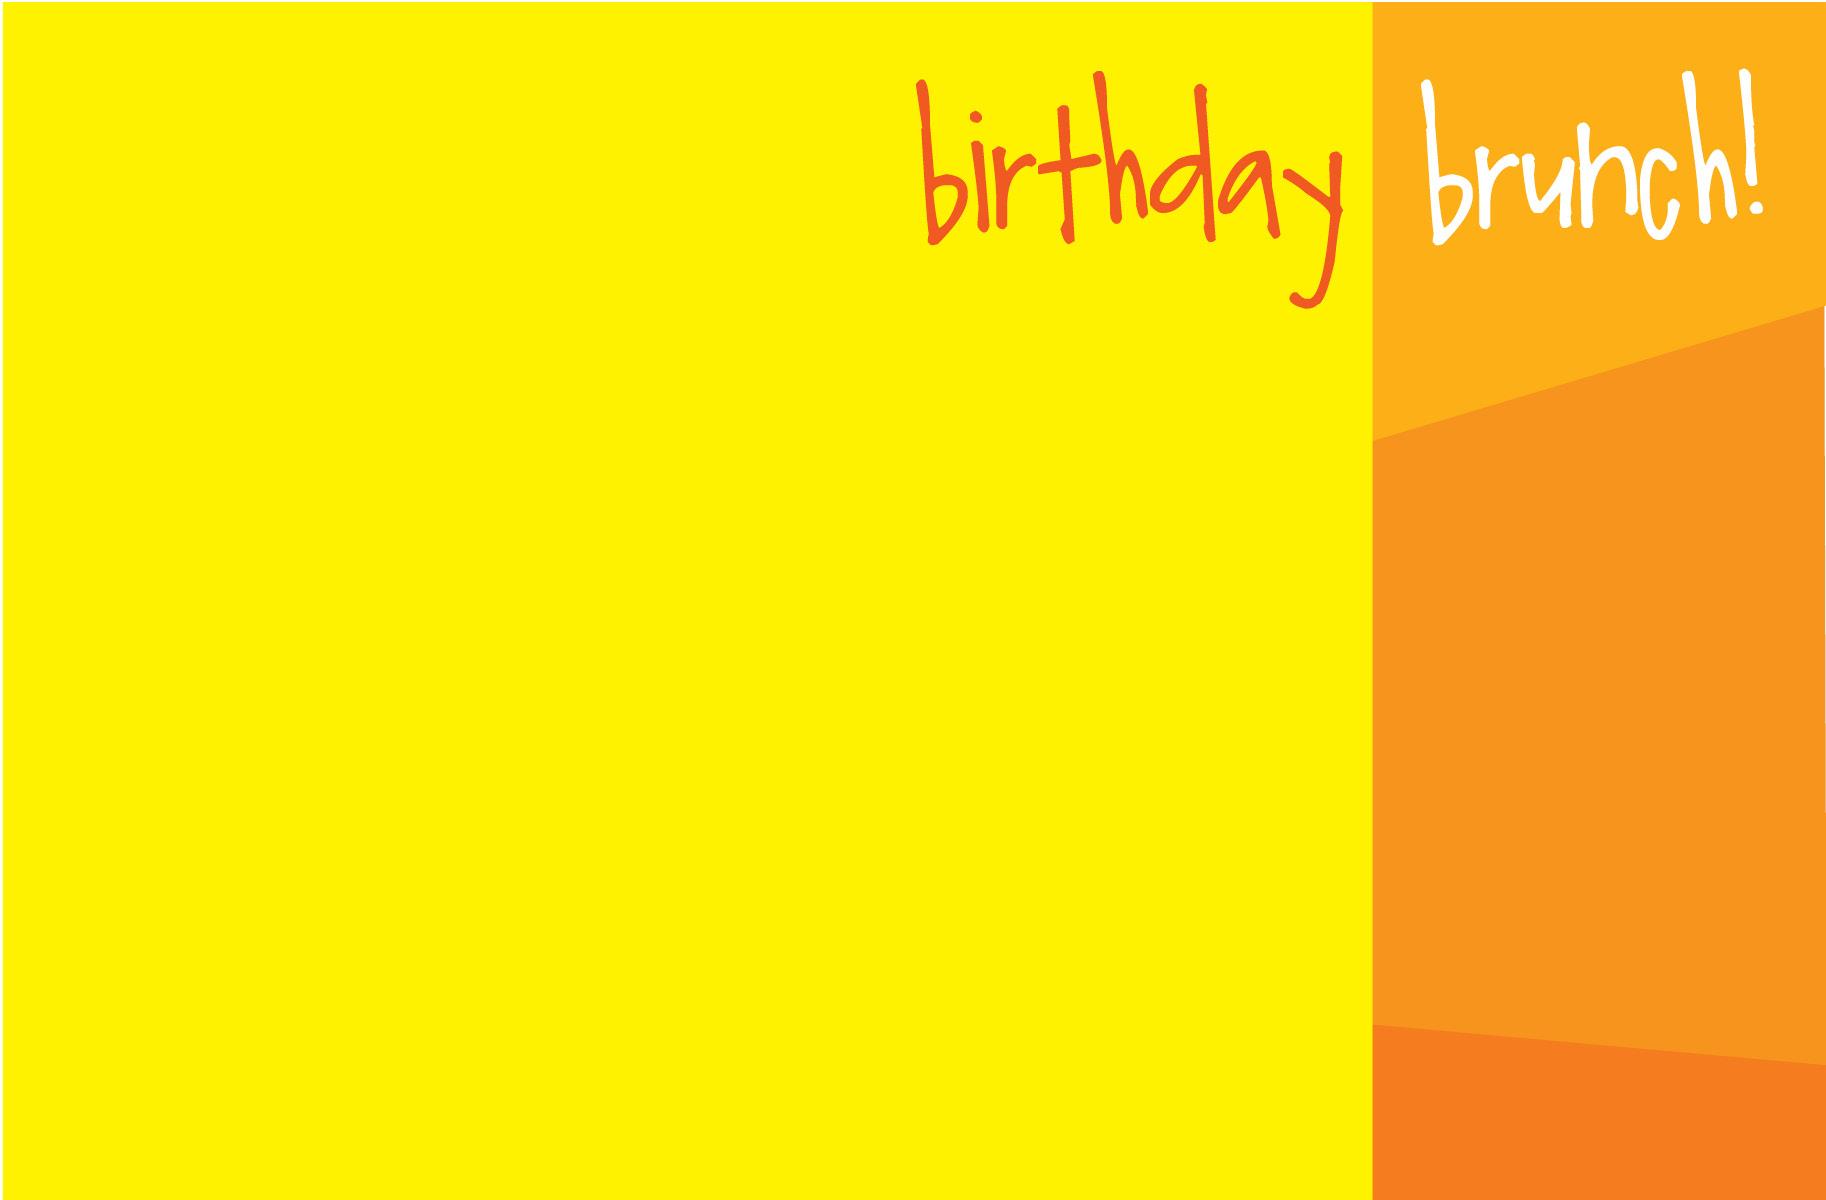 Birthday Brunch Invitations gangcraft